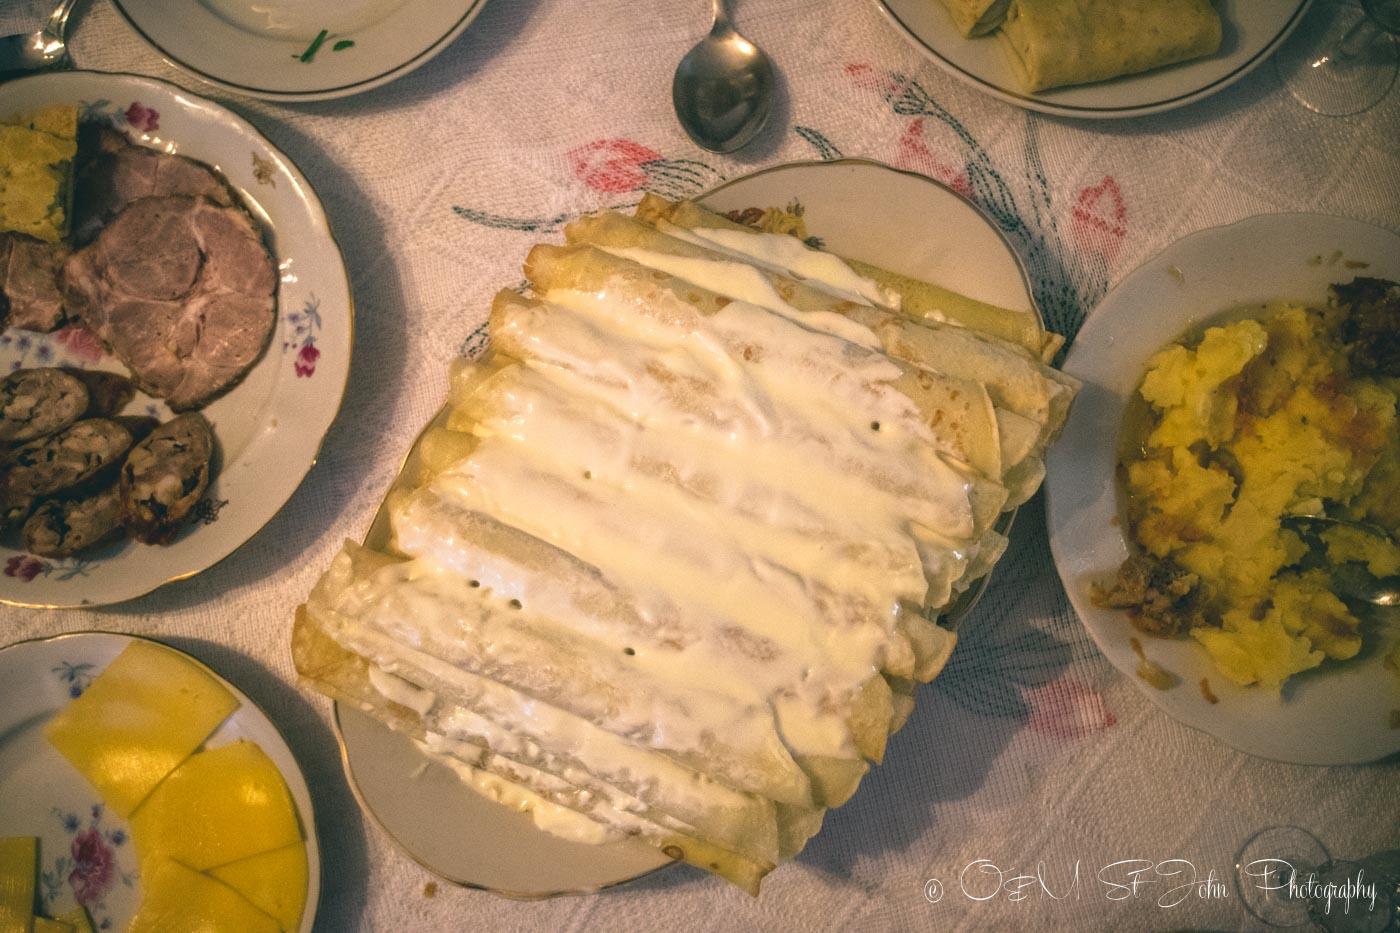 Blinchiki (Ukrainian pancakes) one of the must try dishes in Ukraine. Kiev